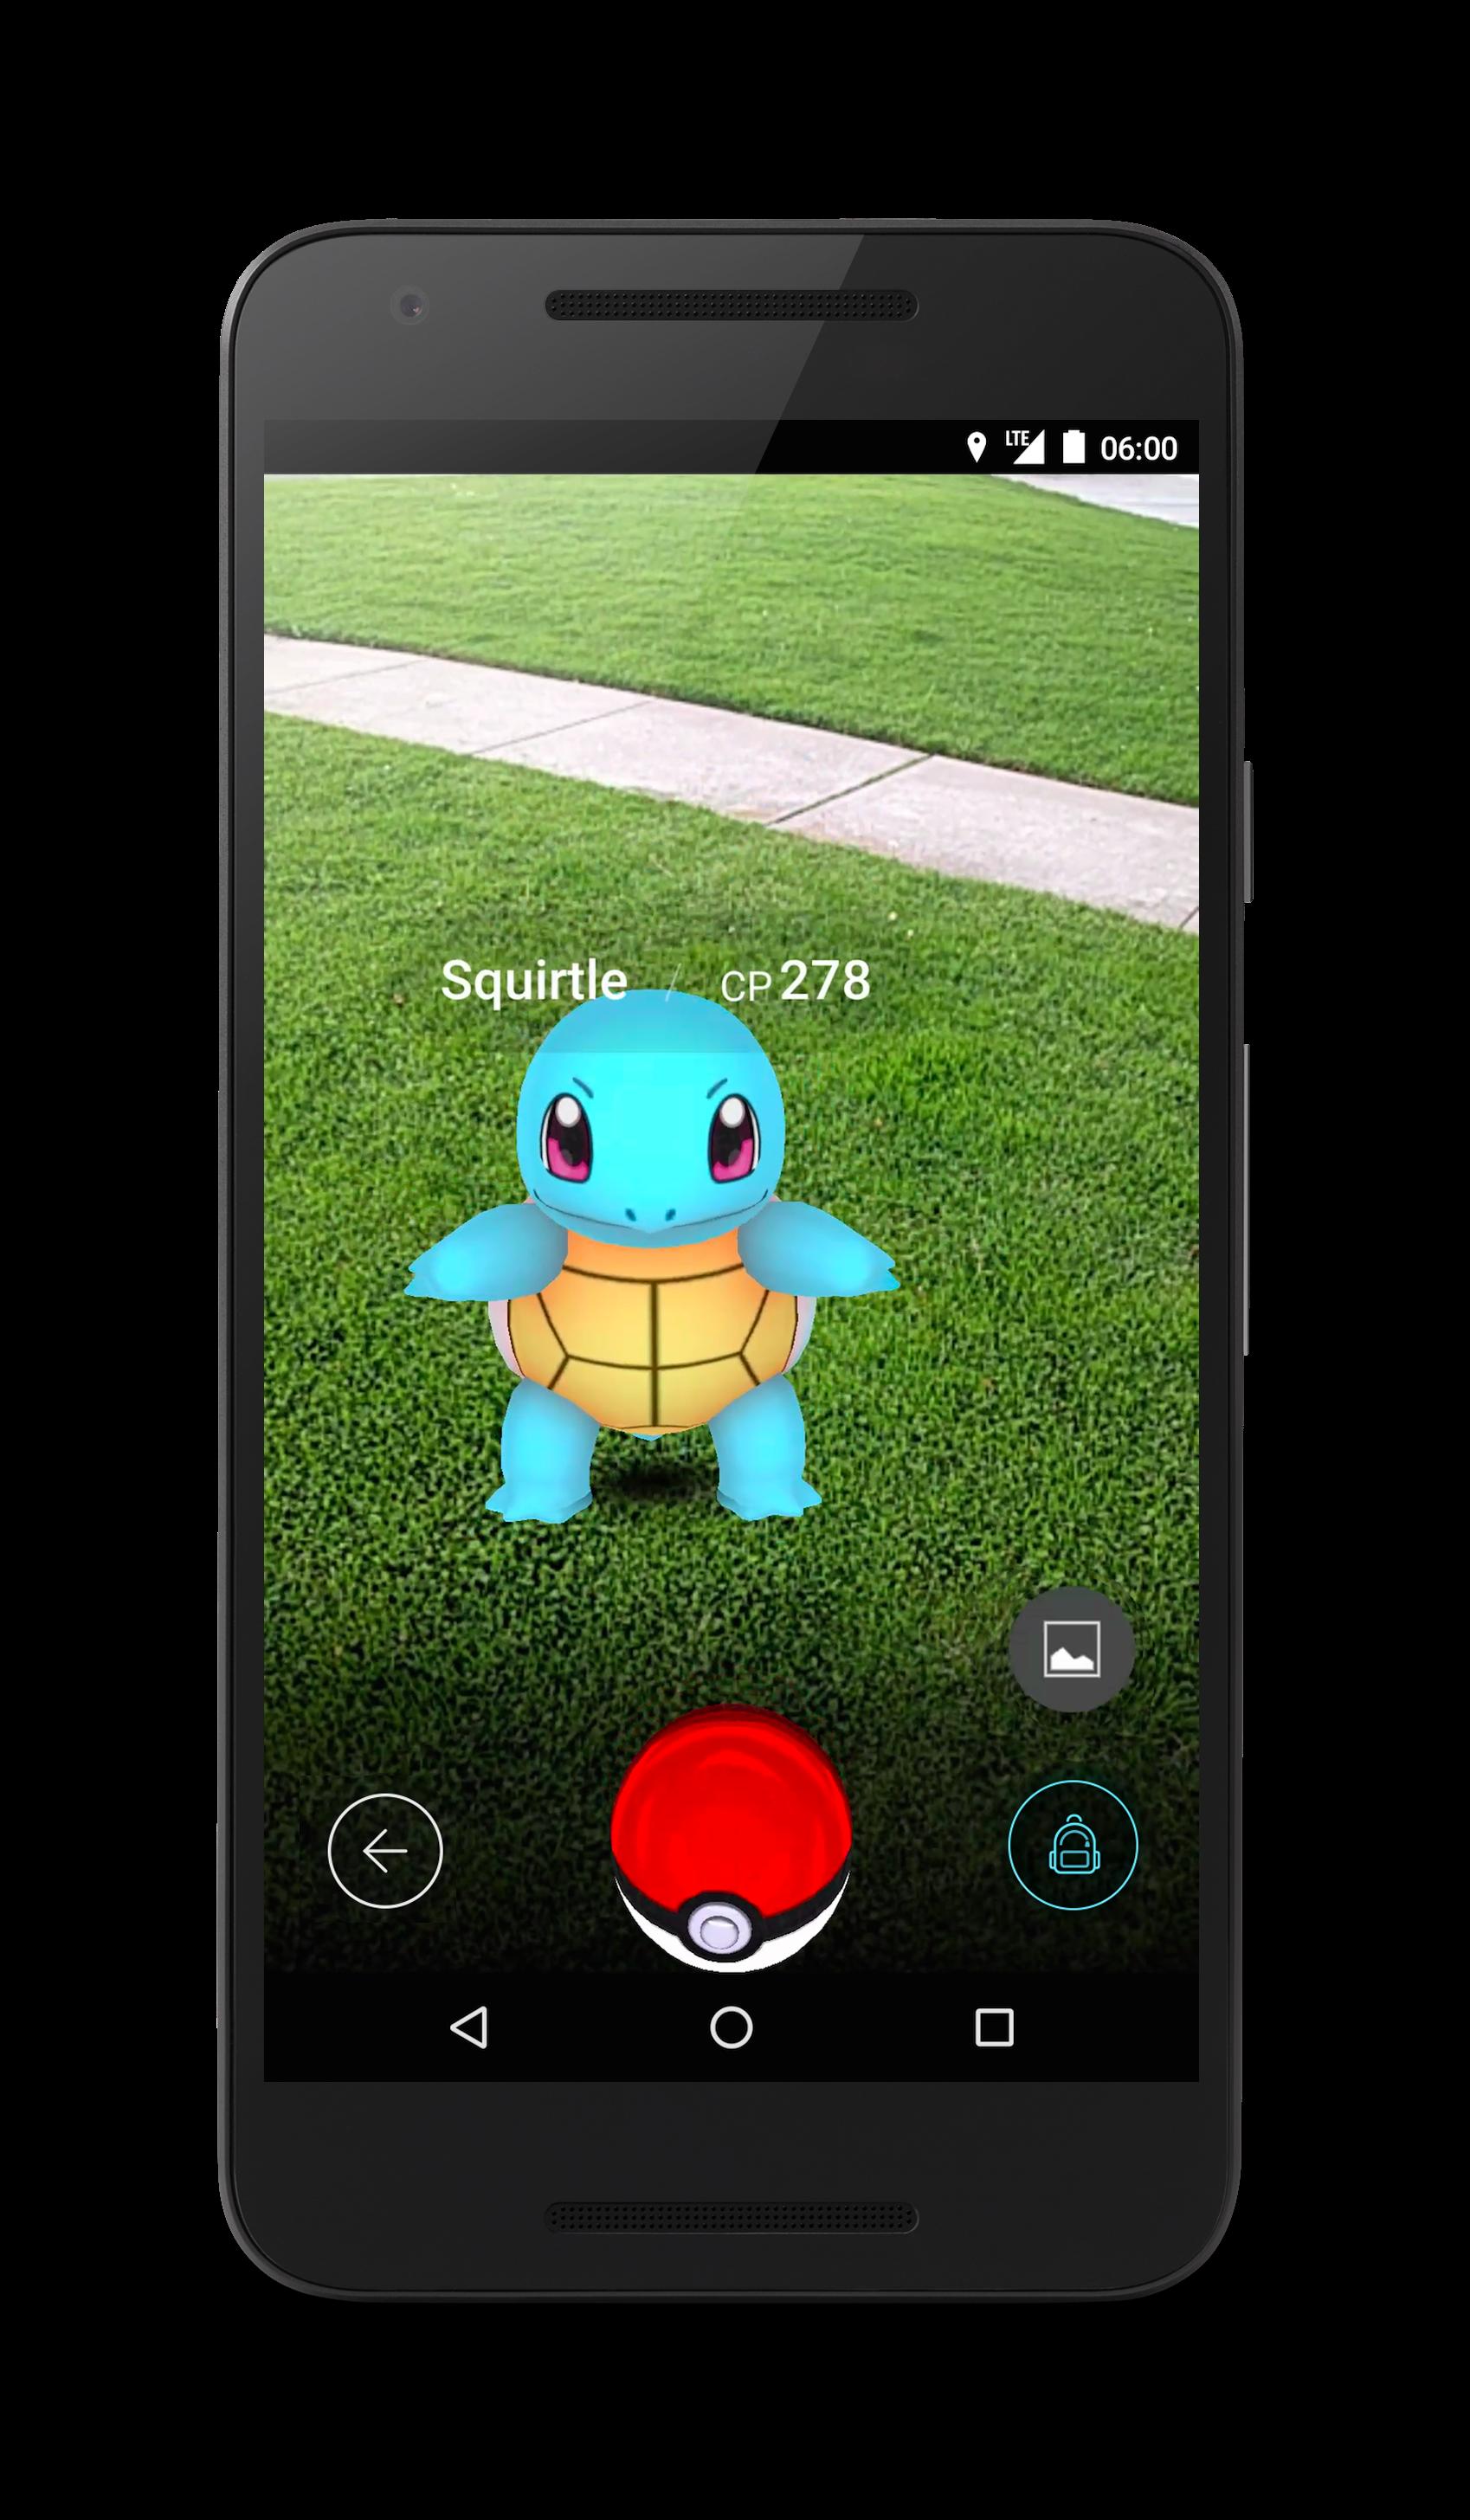 cattura_squirtle_pokemon_go_pokemontimes-it